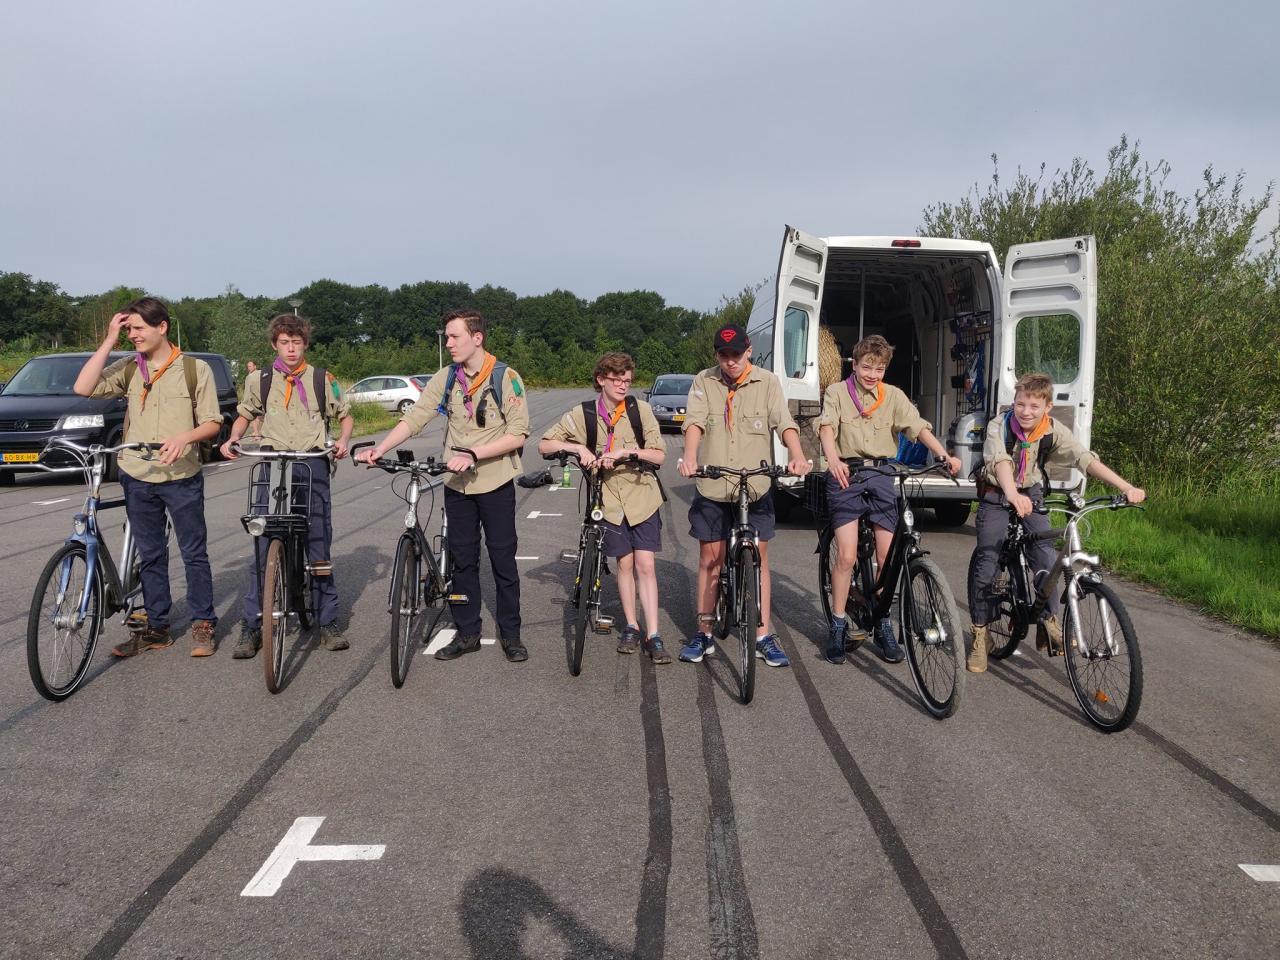 Scouting Impeesa Amerfoort - Verkenner zomerkamp 2020 Zeewolde